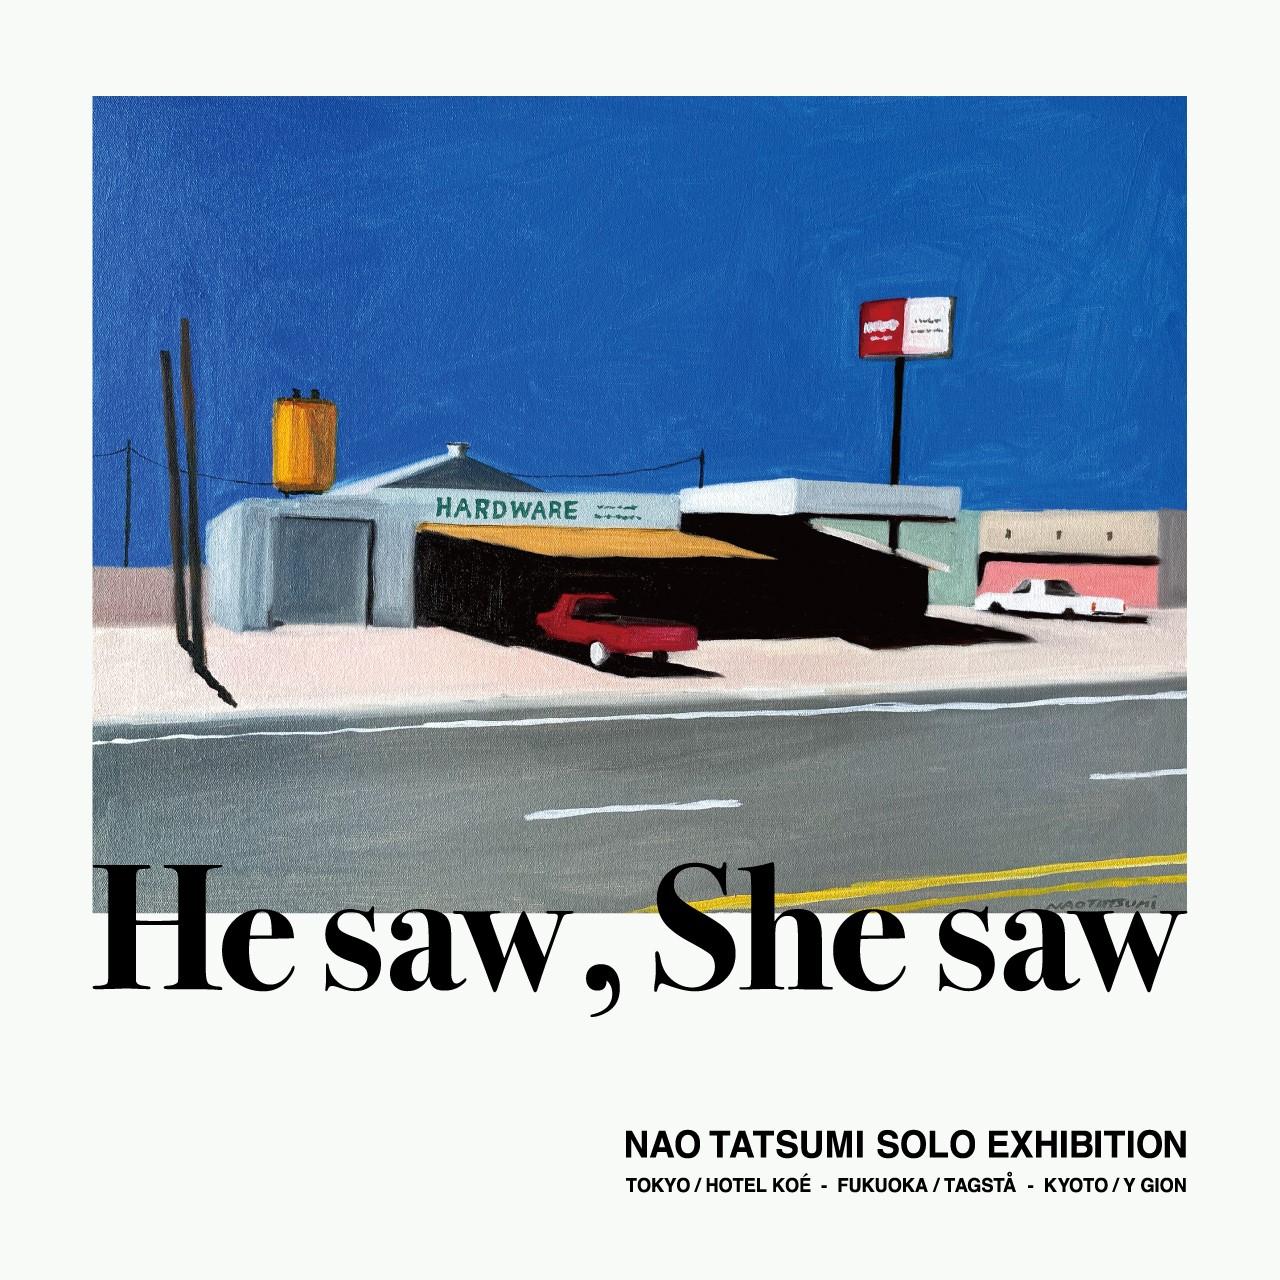 nao-tatsumi-solo-exhibition-he-saw-she-saw1-2-2